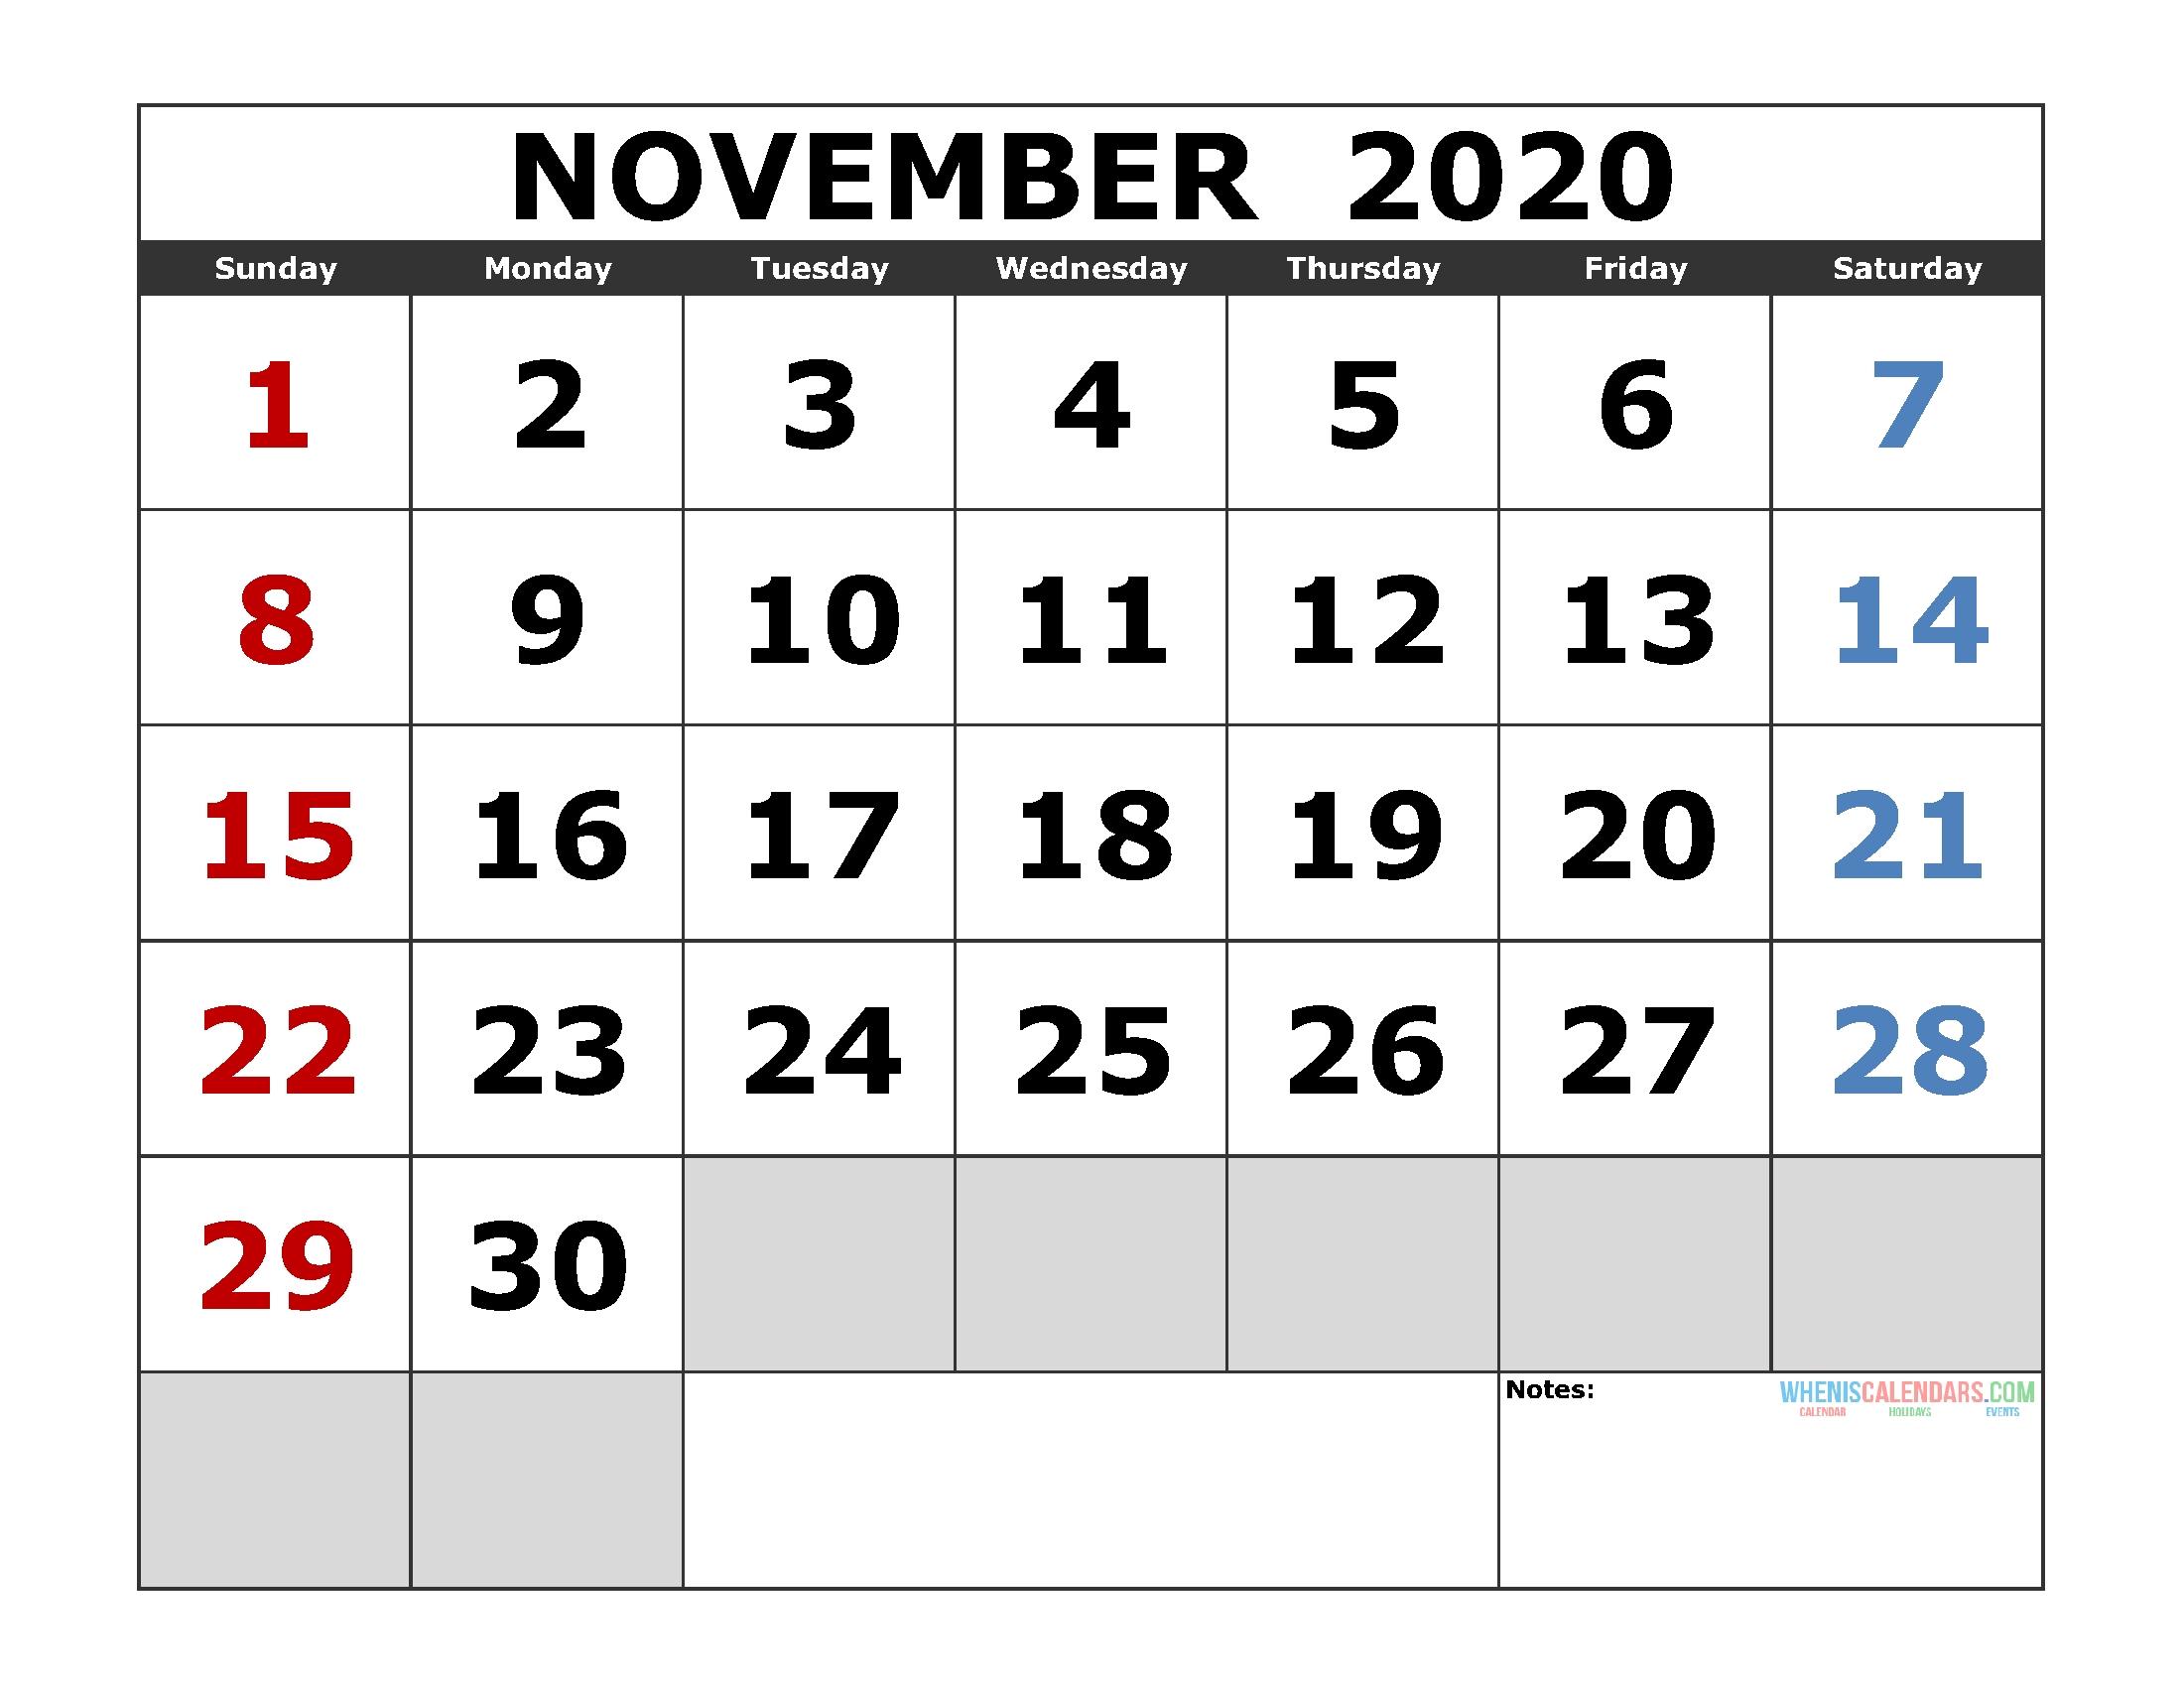 November 2020 Printable Calendar Template Excel, Pdf, Image Incredible 2020 Printable Calendars Including Holidays And Jewish Holidays